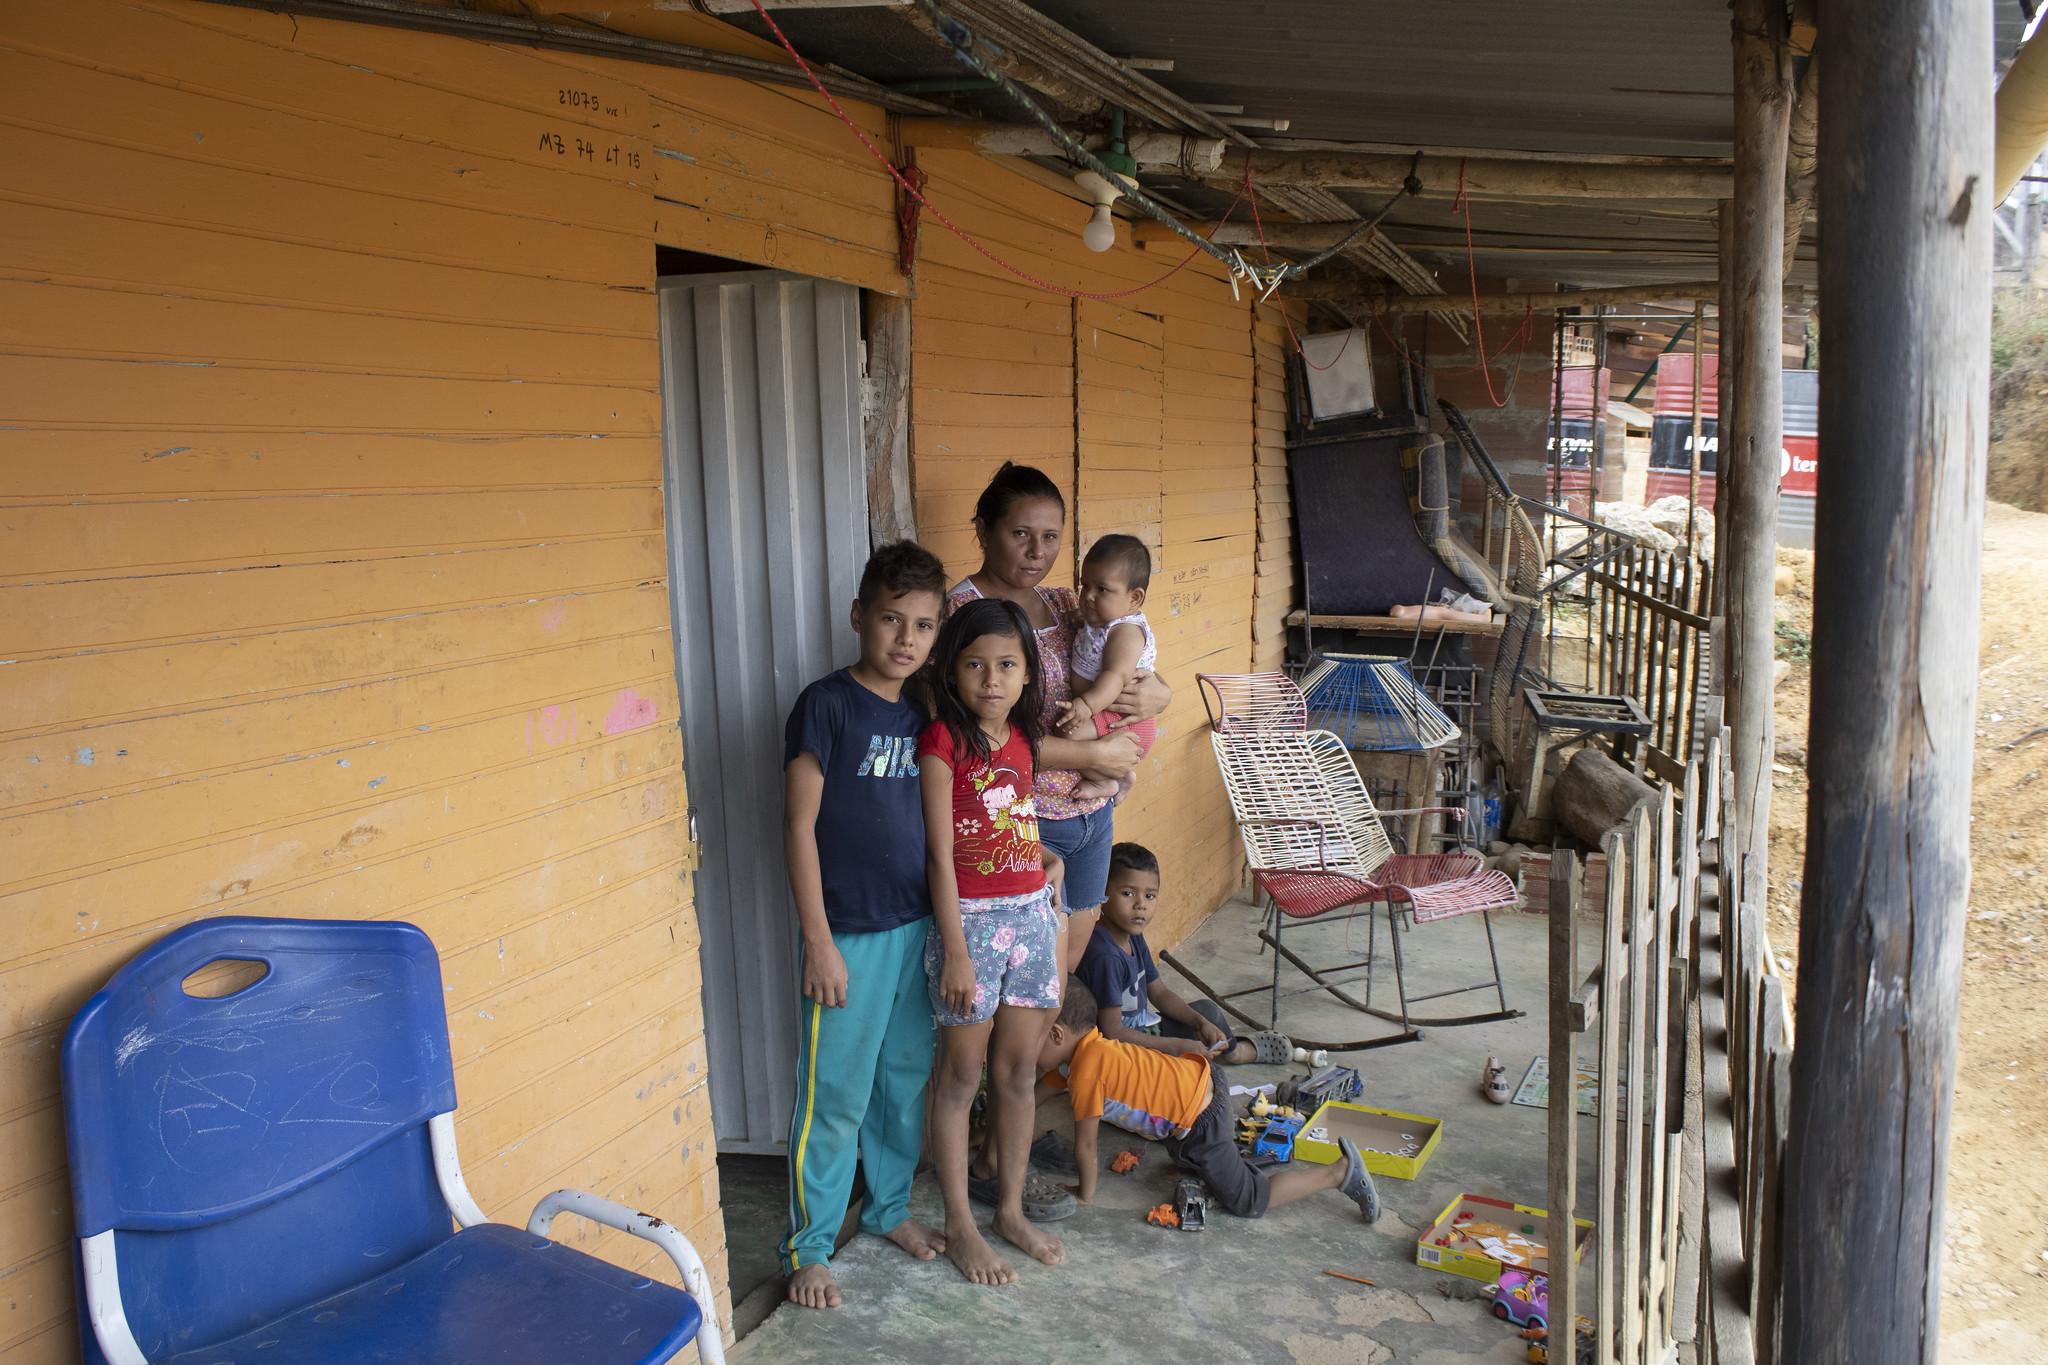 family in Venezuela migratory crisis